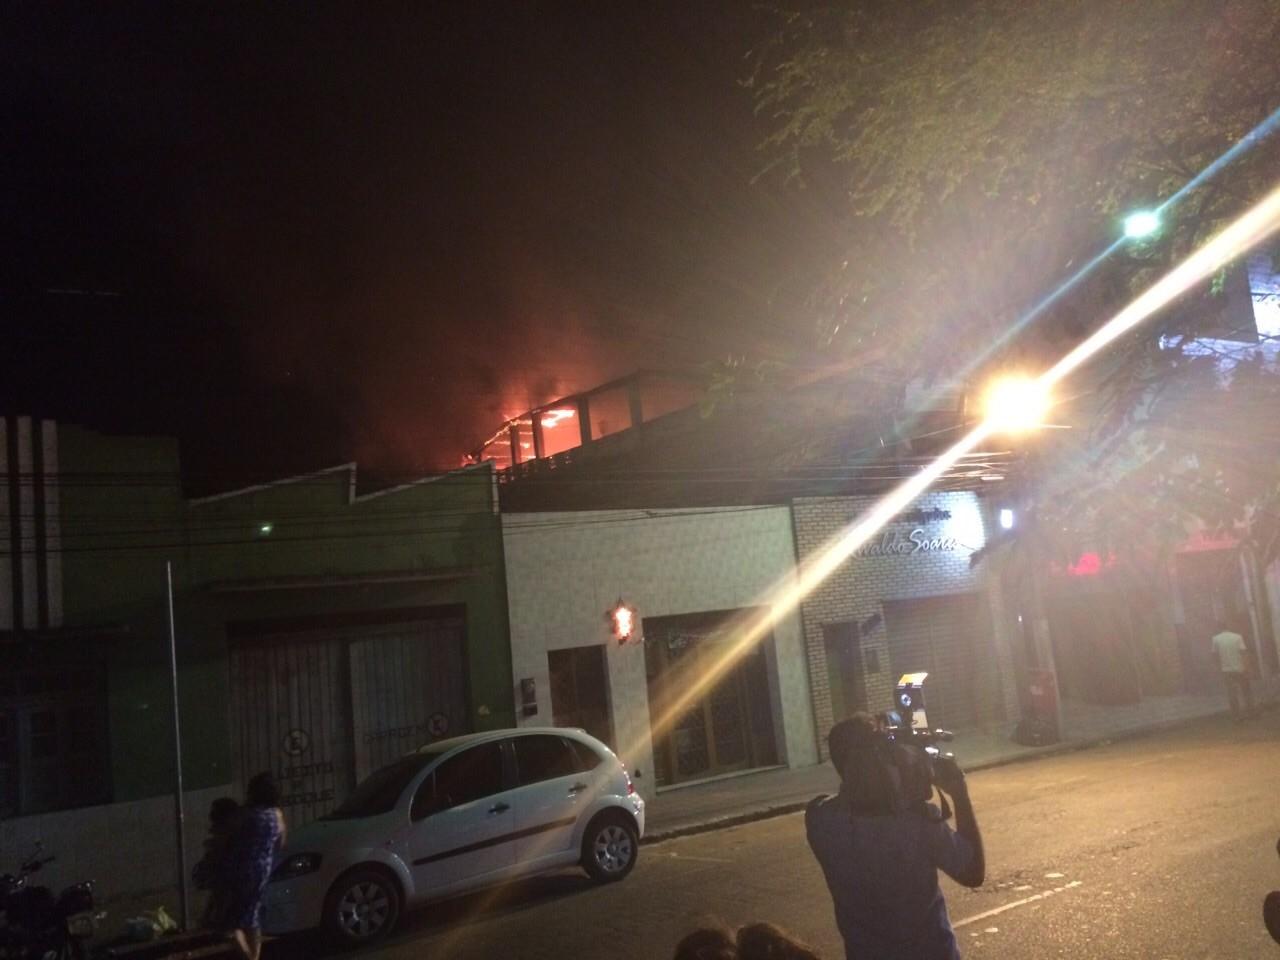 Incêndio atinge casa na Rua Nunes Machado, no Centro de Caruaru, Agreste de Pernambuco (Foto: Monike Freitas/ TV Asa Branca)